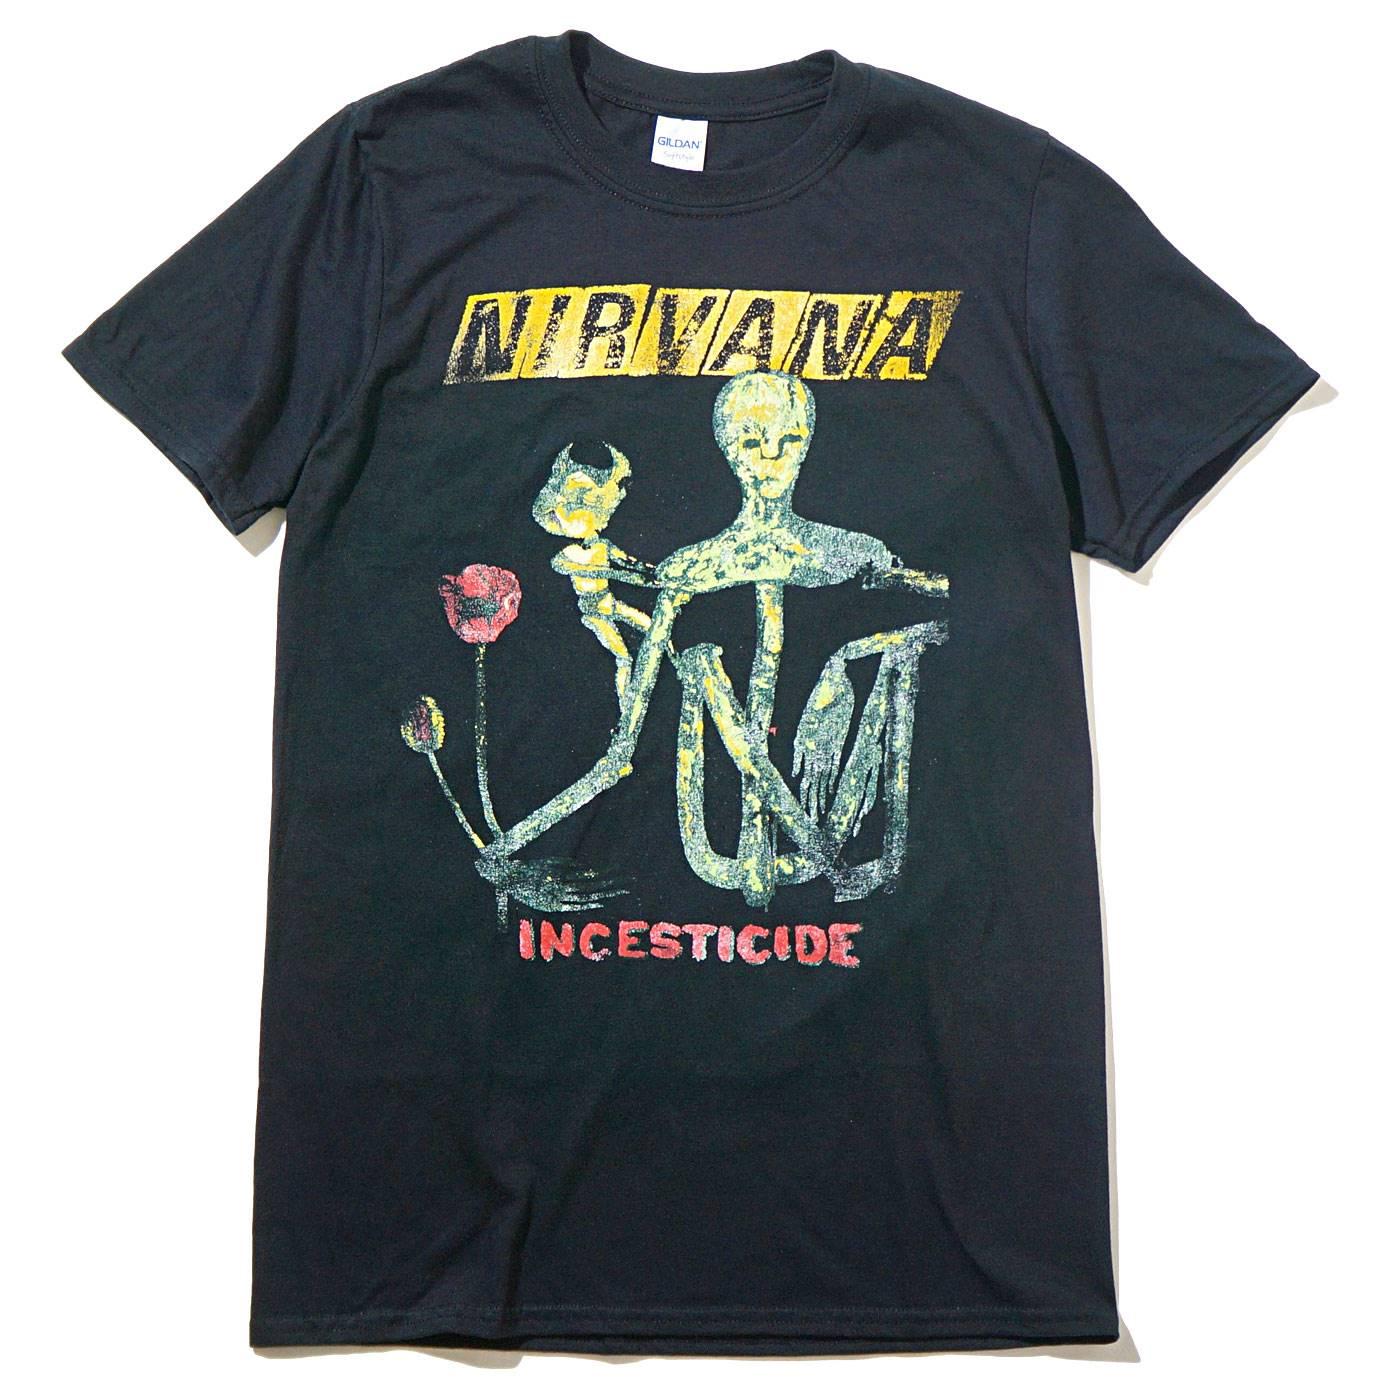 NIRVANA Tシャツ Reformant Incesticide-Black